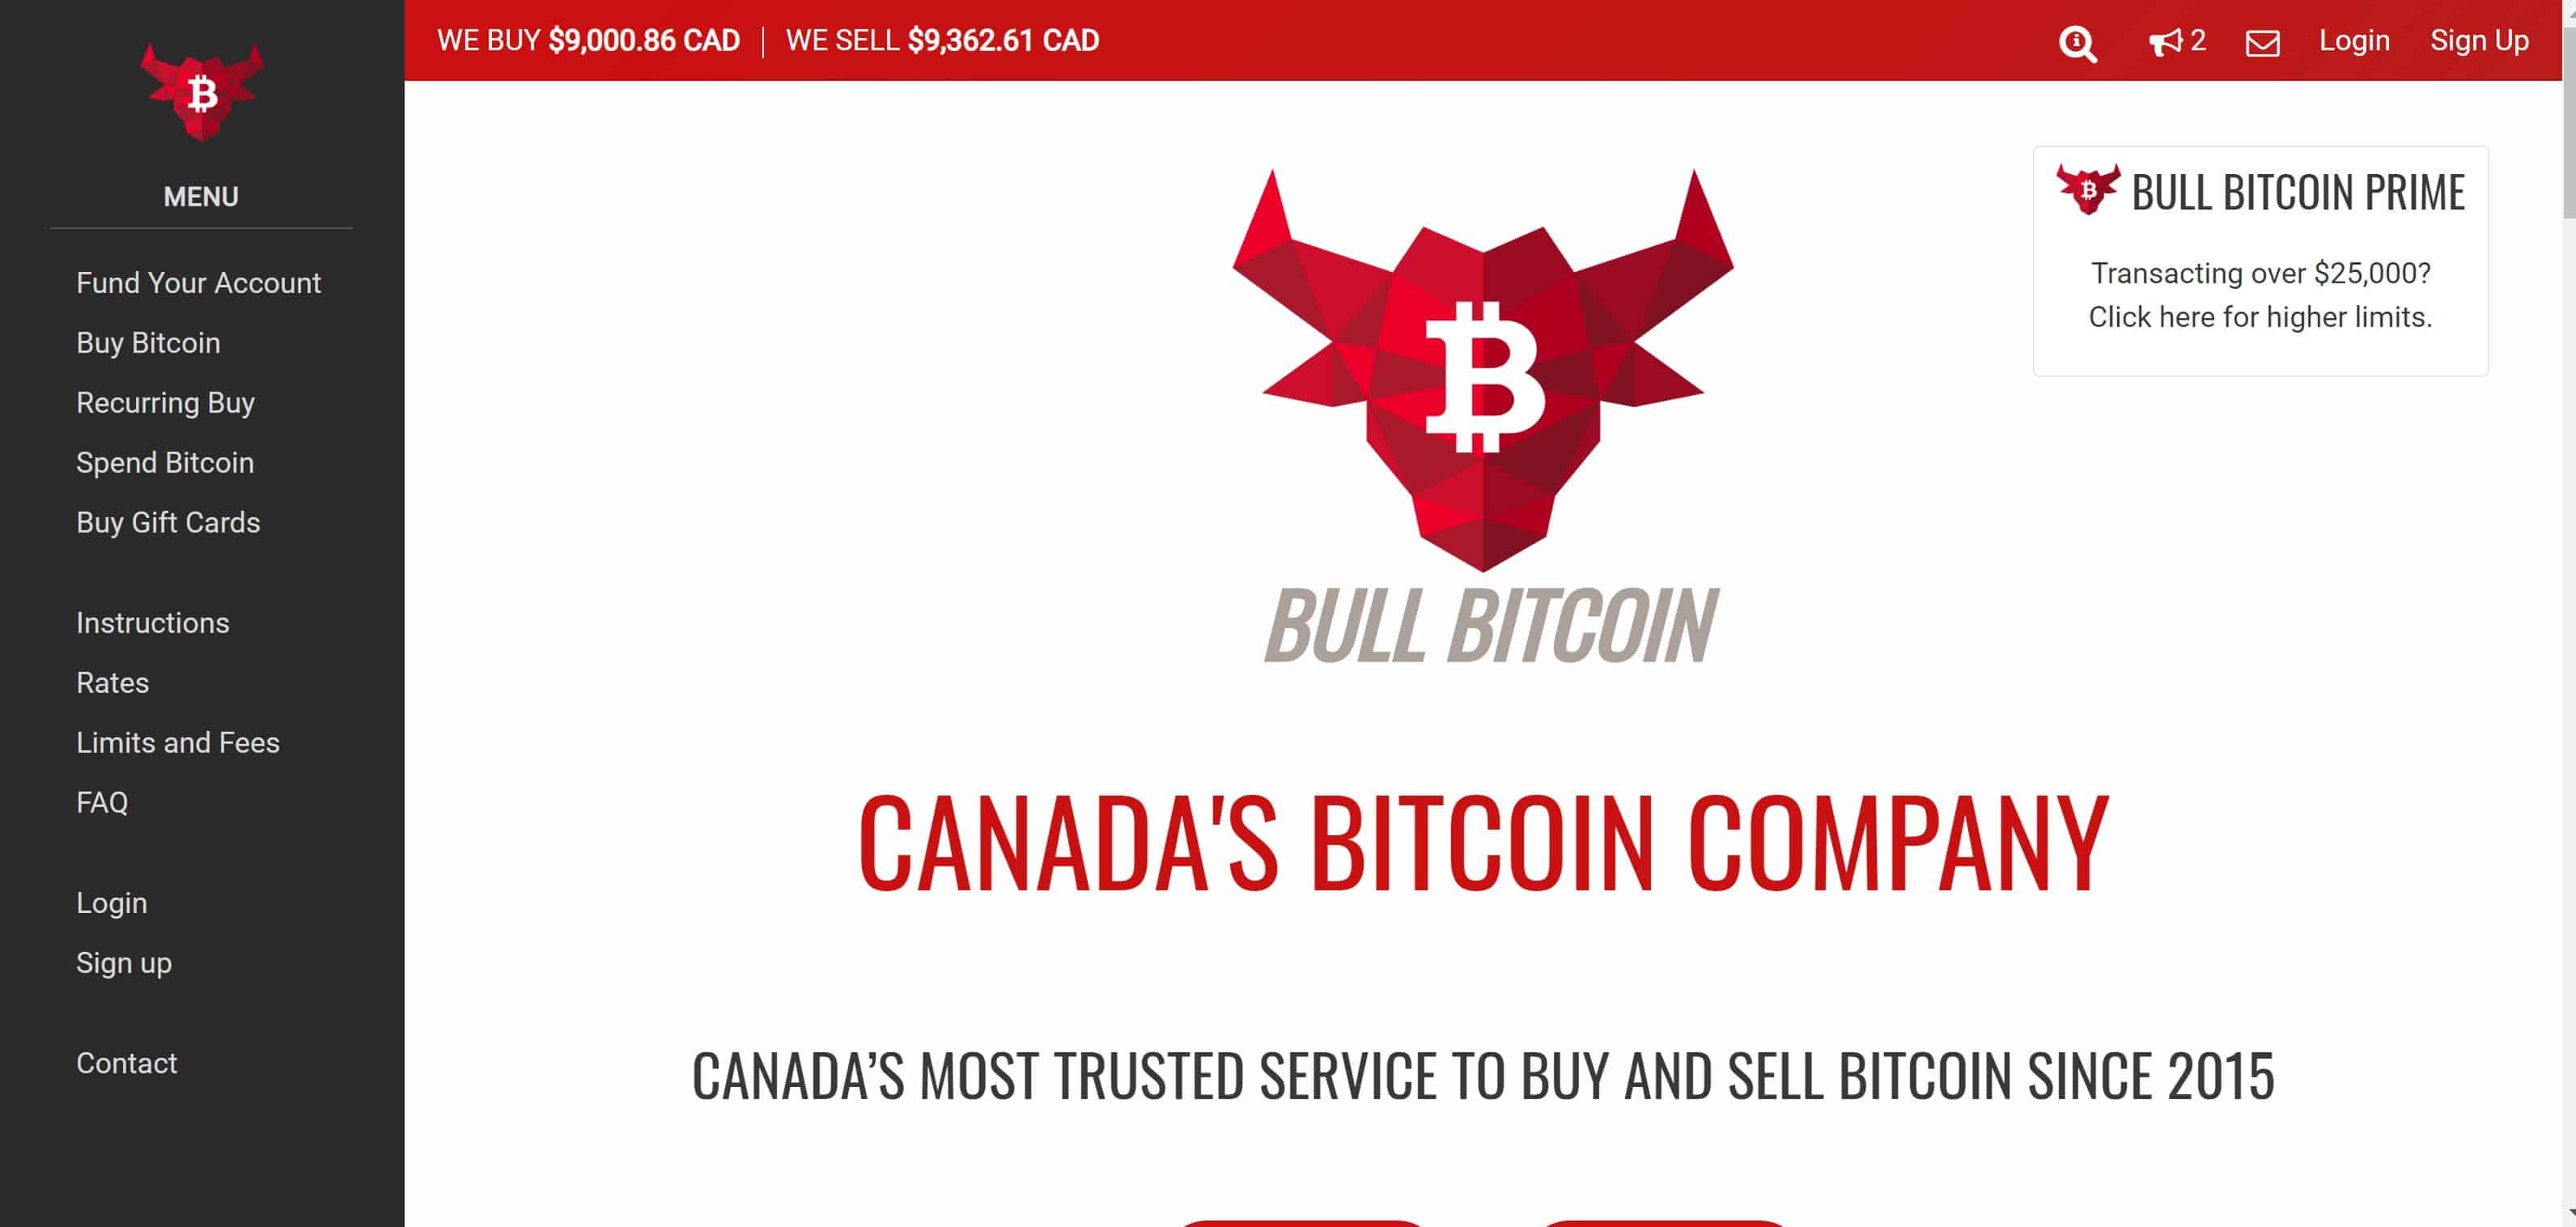 Bull Bitcoin Website